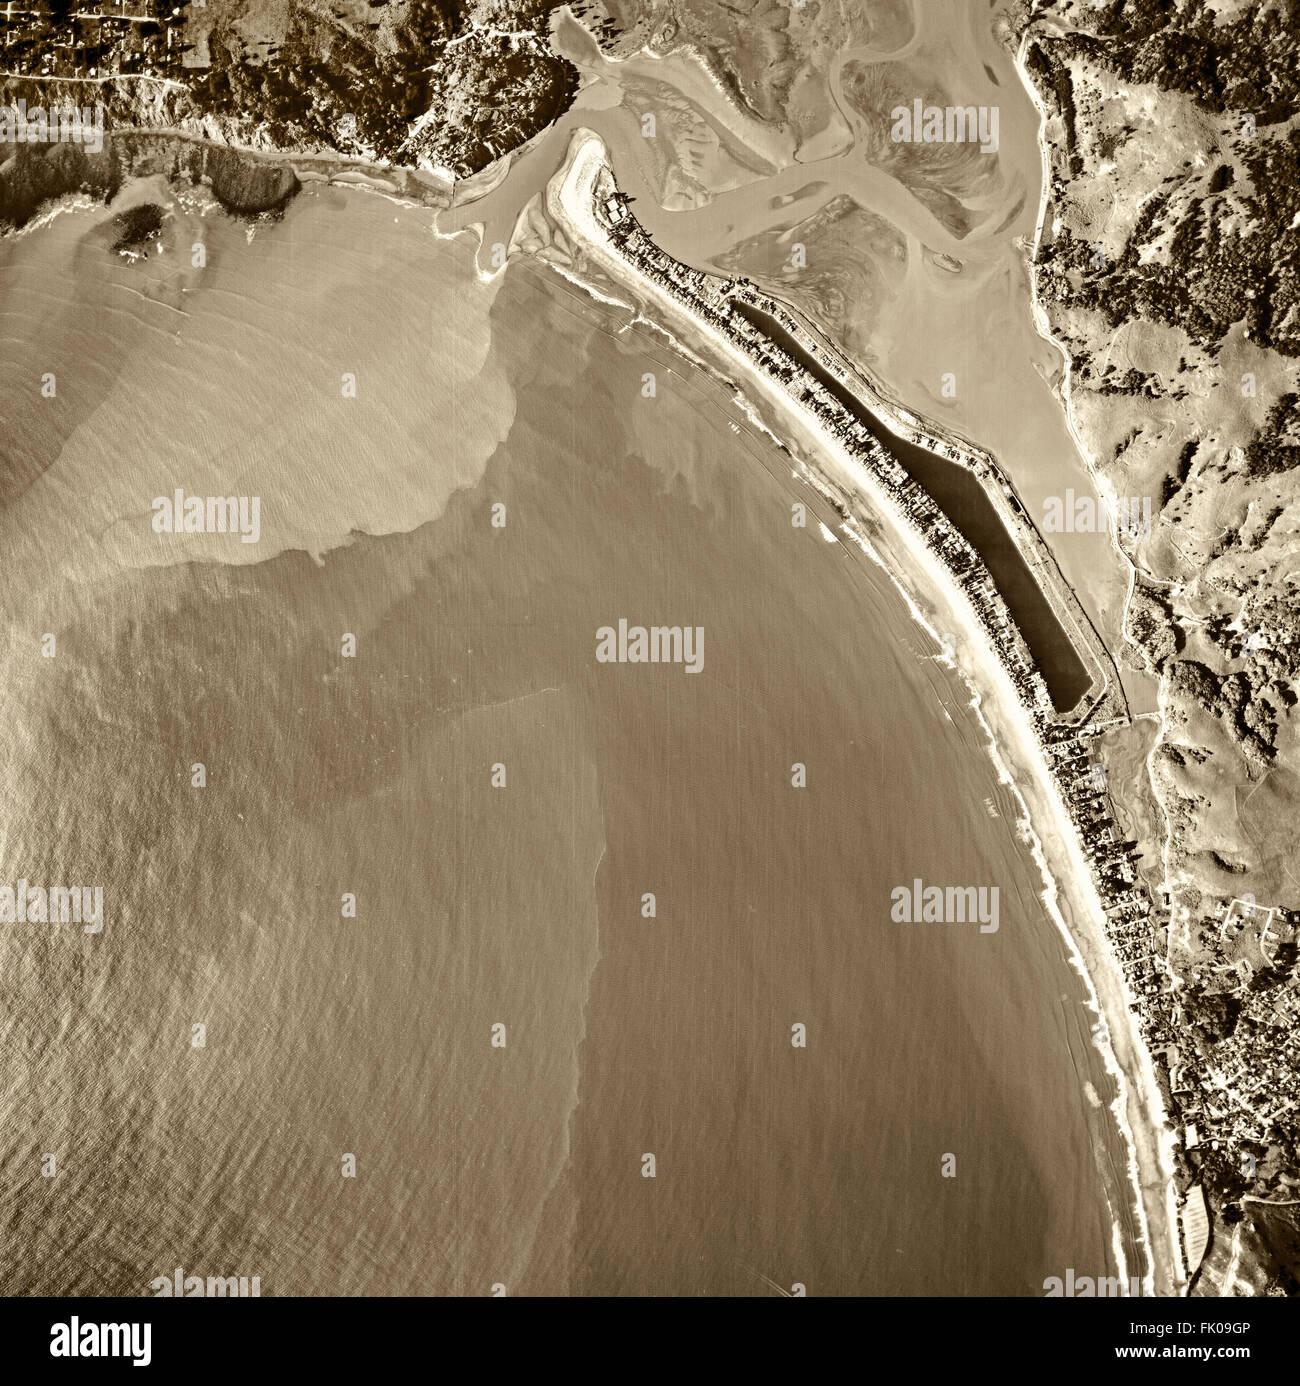 historical aerial photograph of Stinson Beach, Bolinas and the Bolinas Bay and Bolinas Lagoon, Marin County, California, - Stock Image